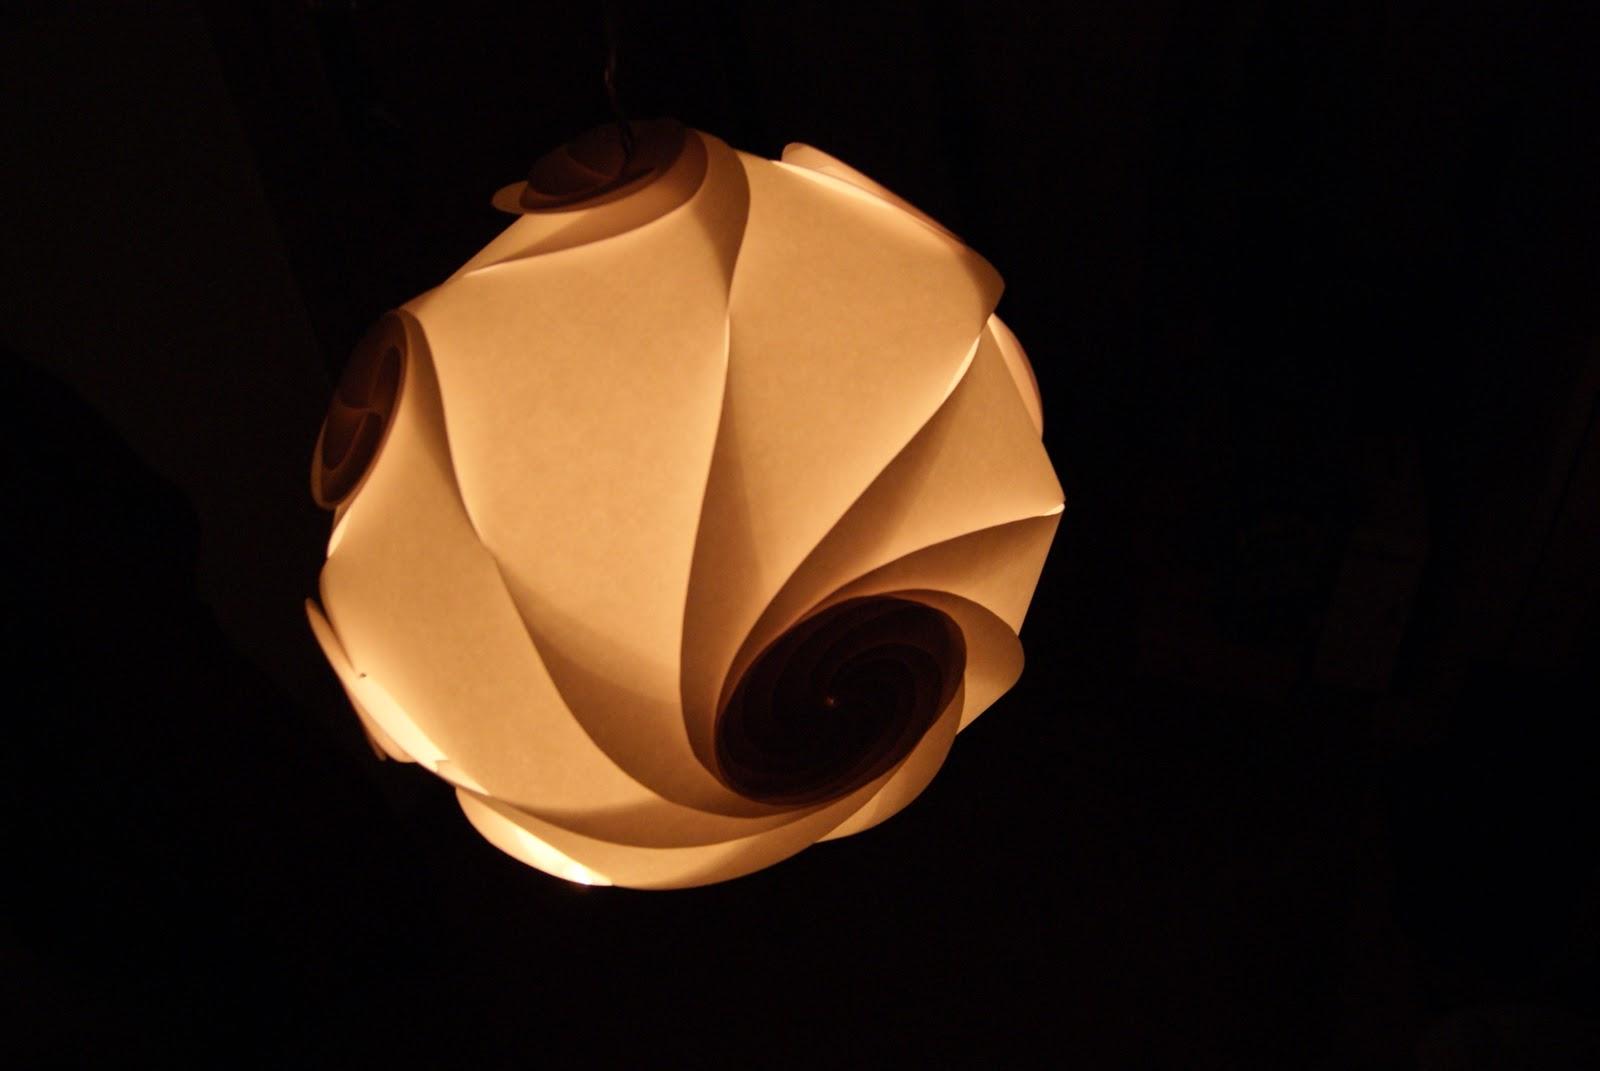 Wildres meine lampen for Lampen papier